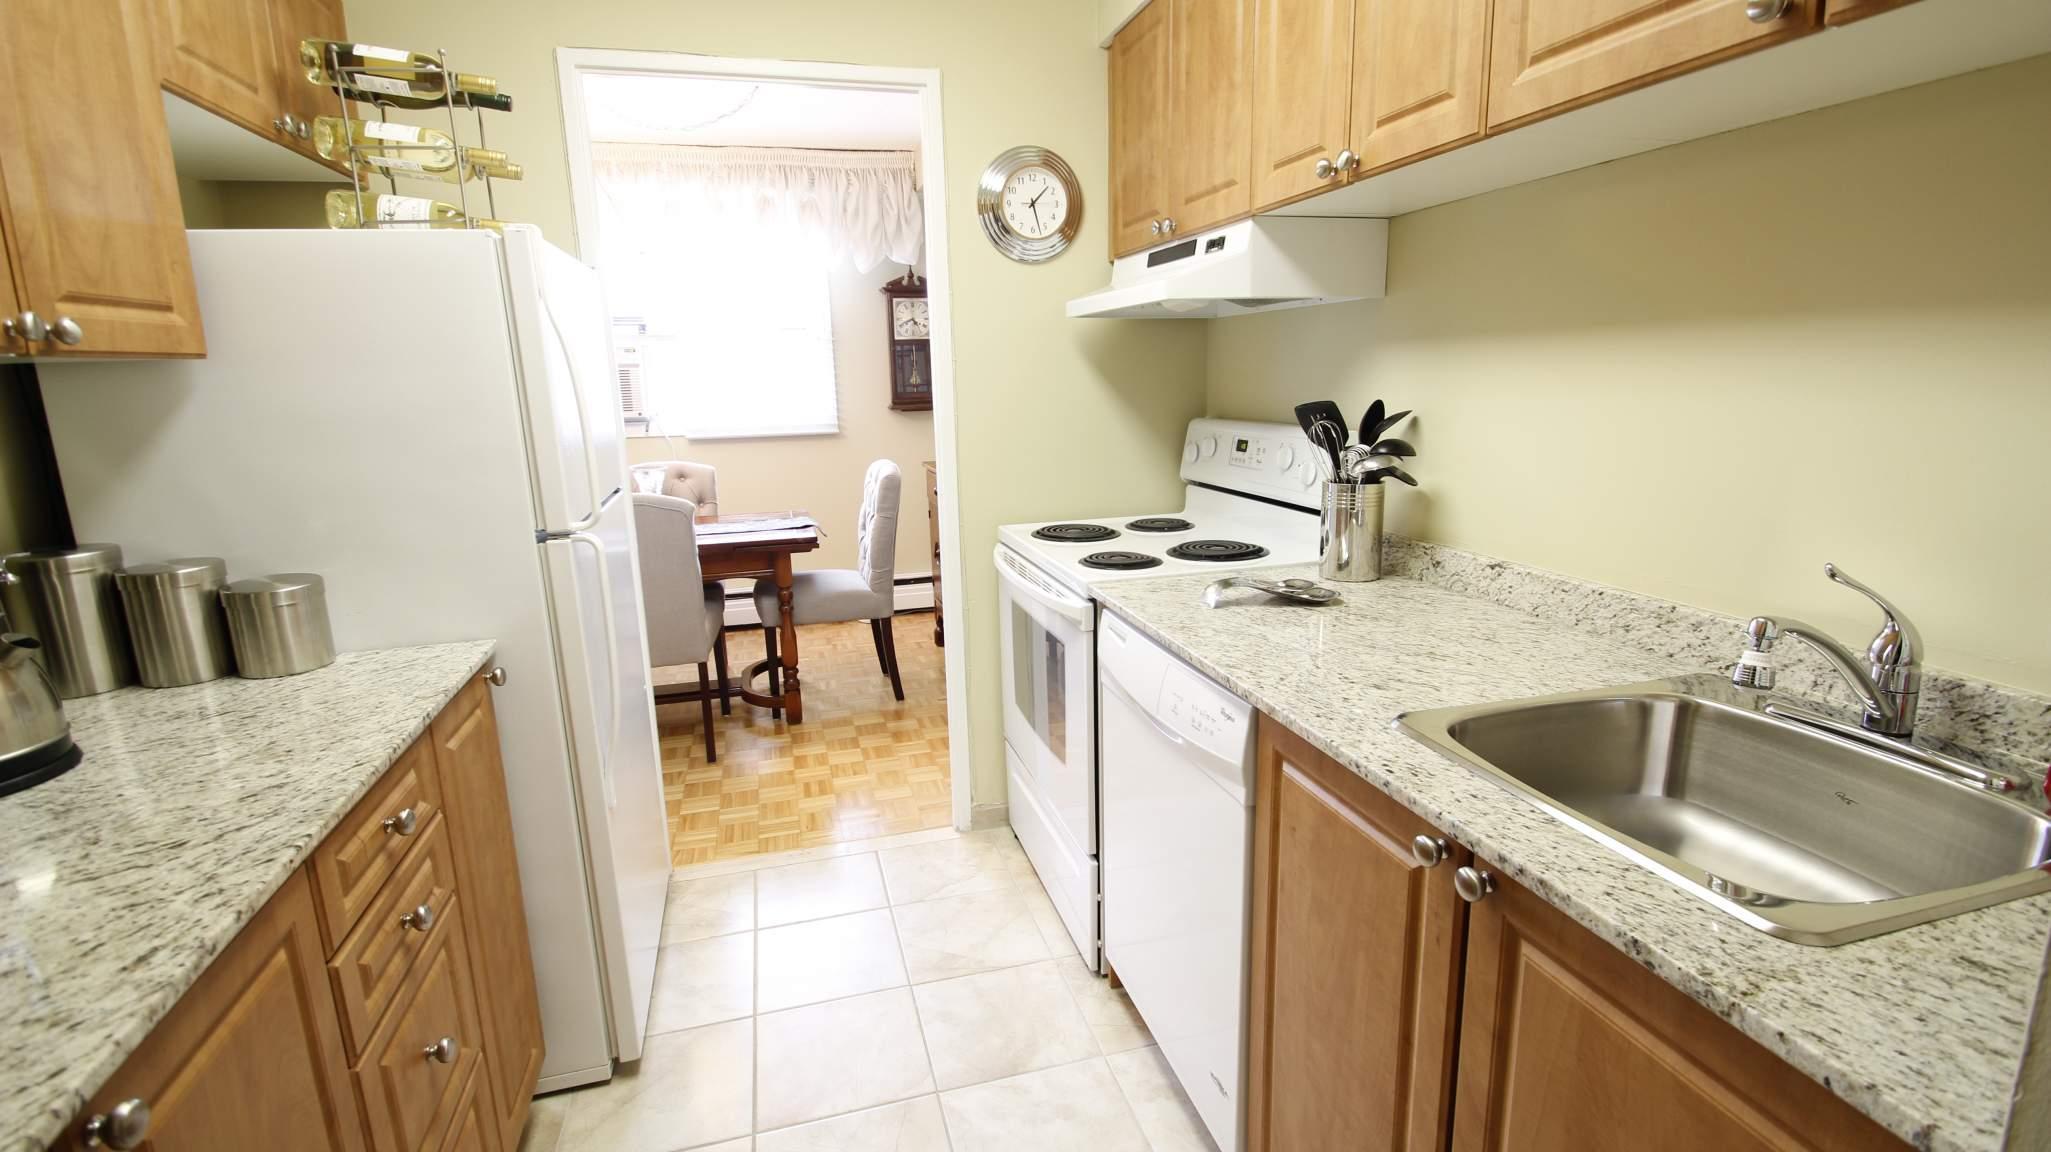 Lamplighter apartments ottawa on walk score for Lamp lighter apartments